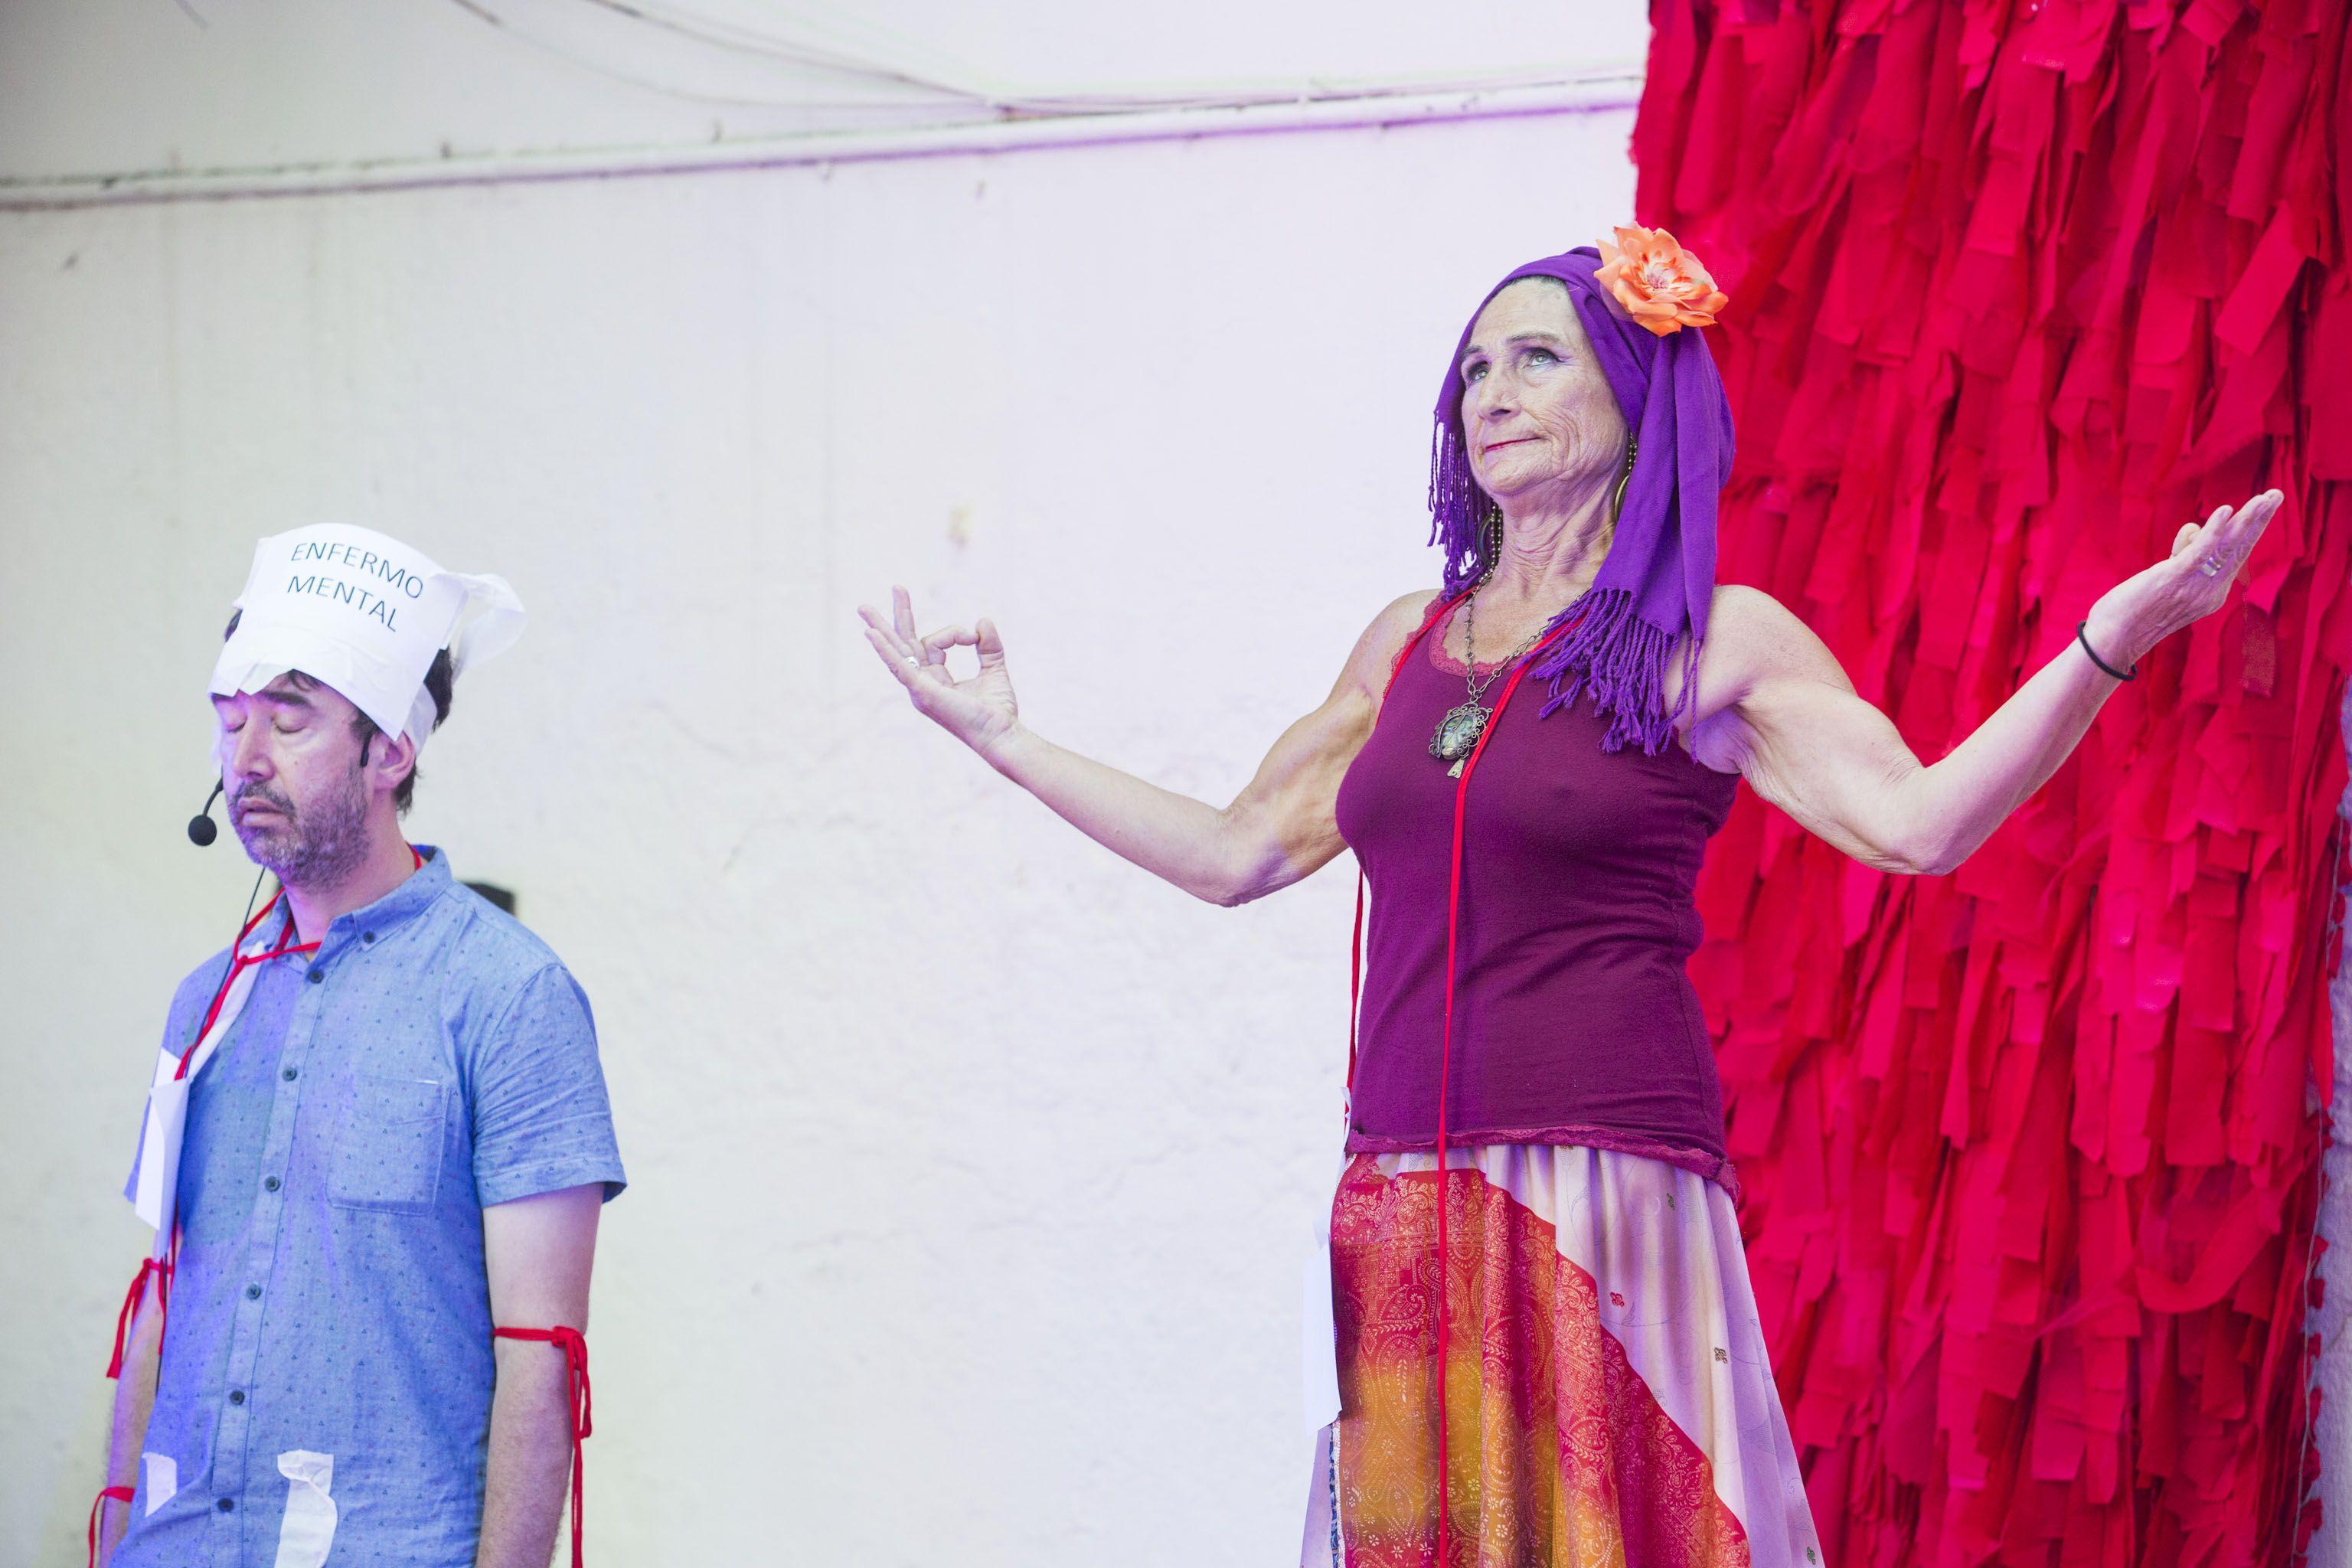 Grupos TO - Teatro para otras realidades posibles